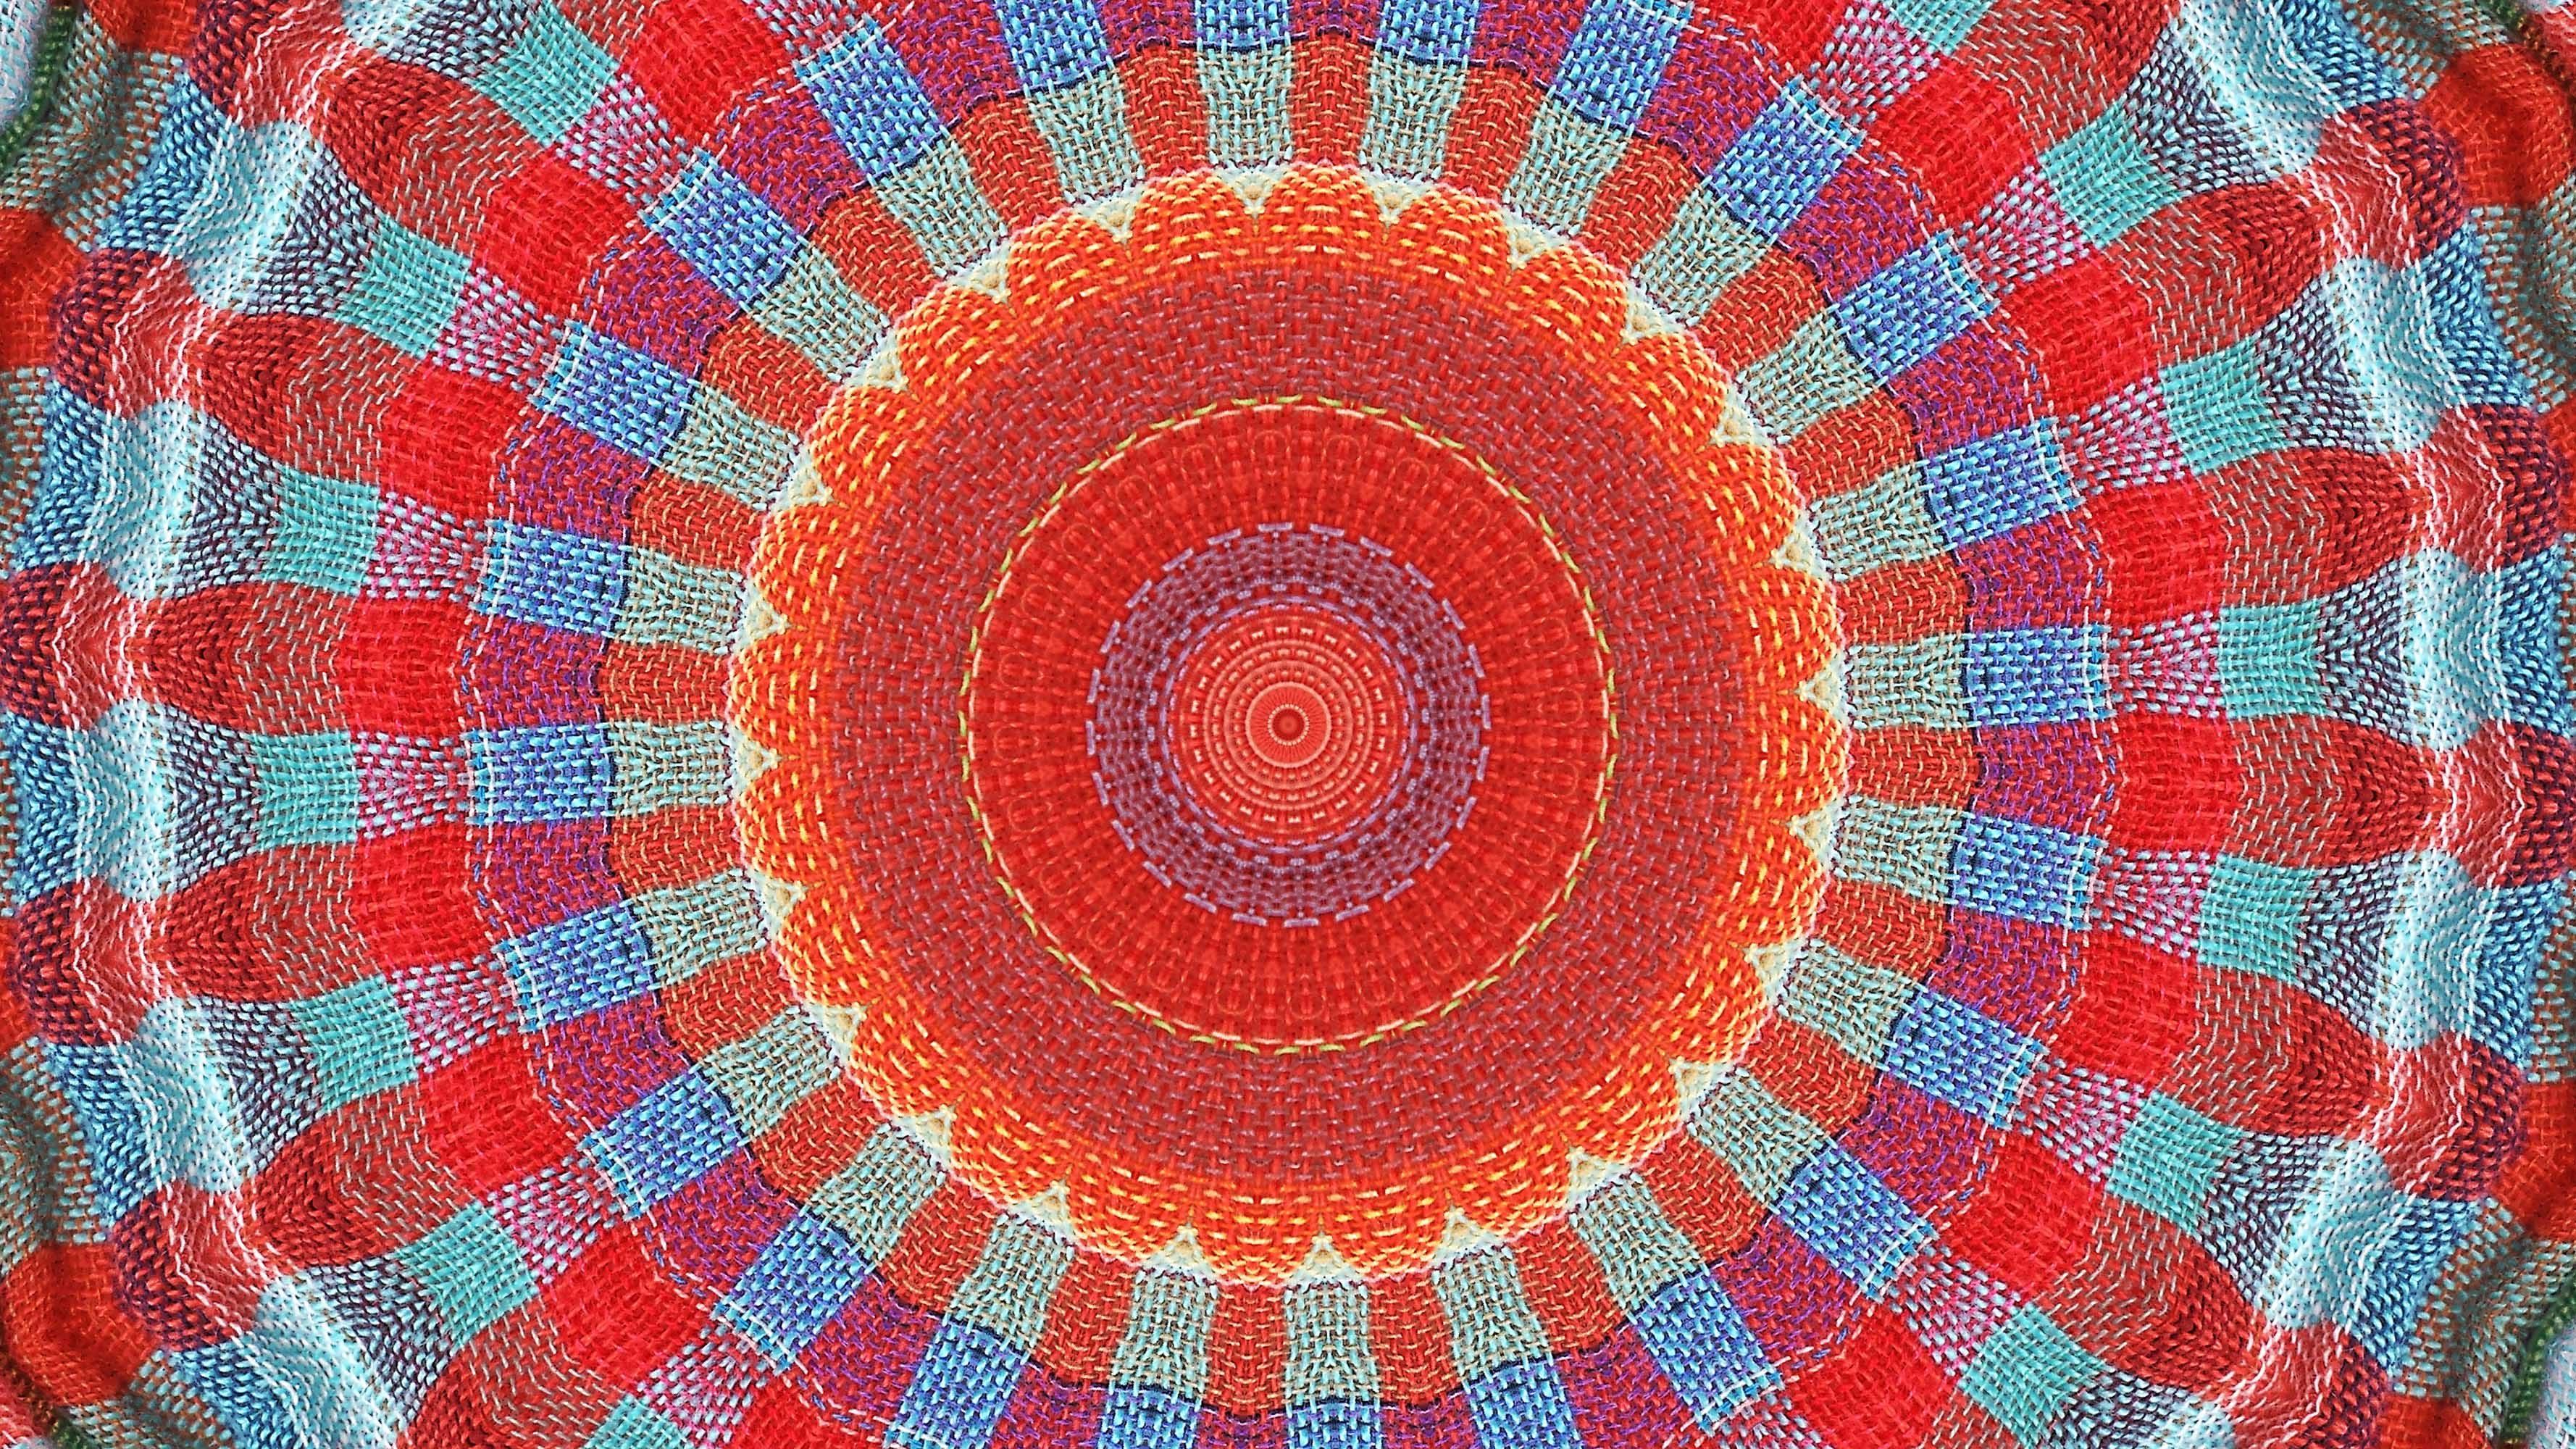 Red and blue radiating mandala